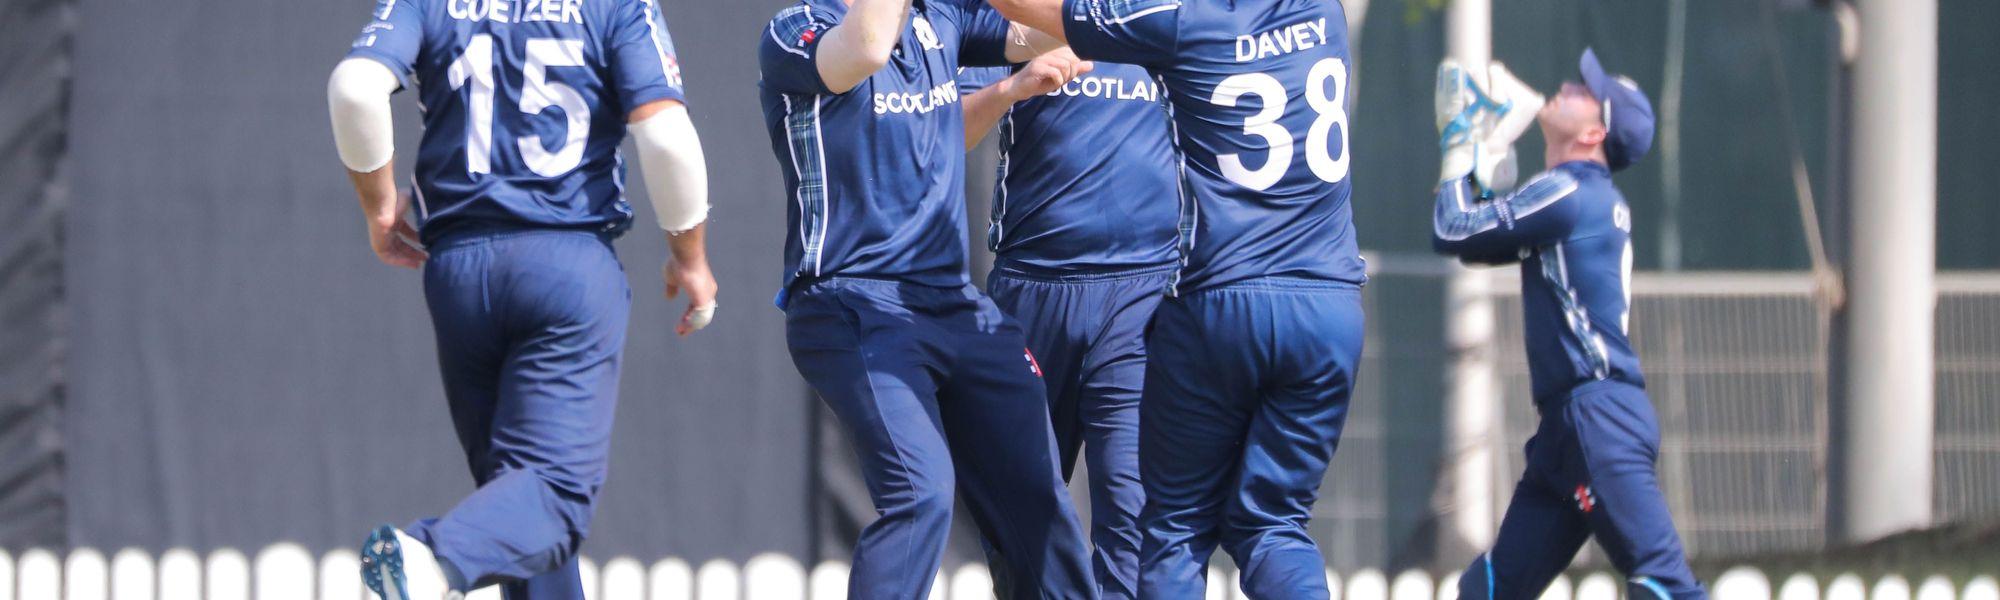 Scotland celebrate a wicket.